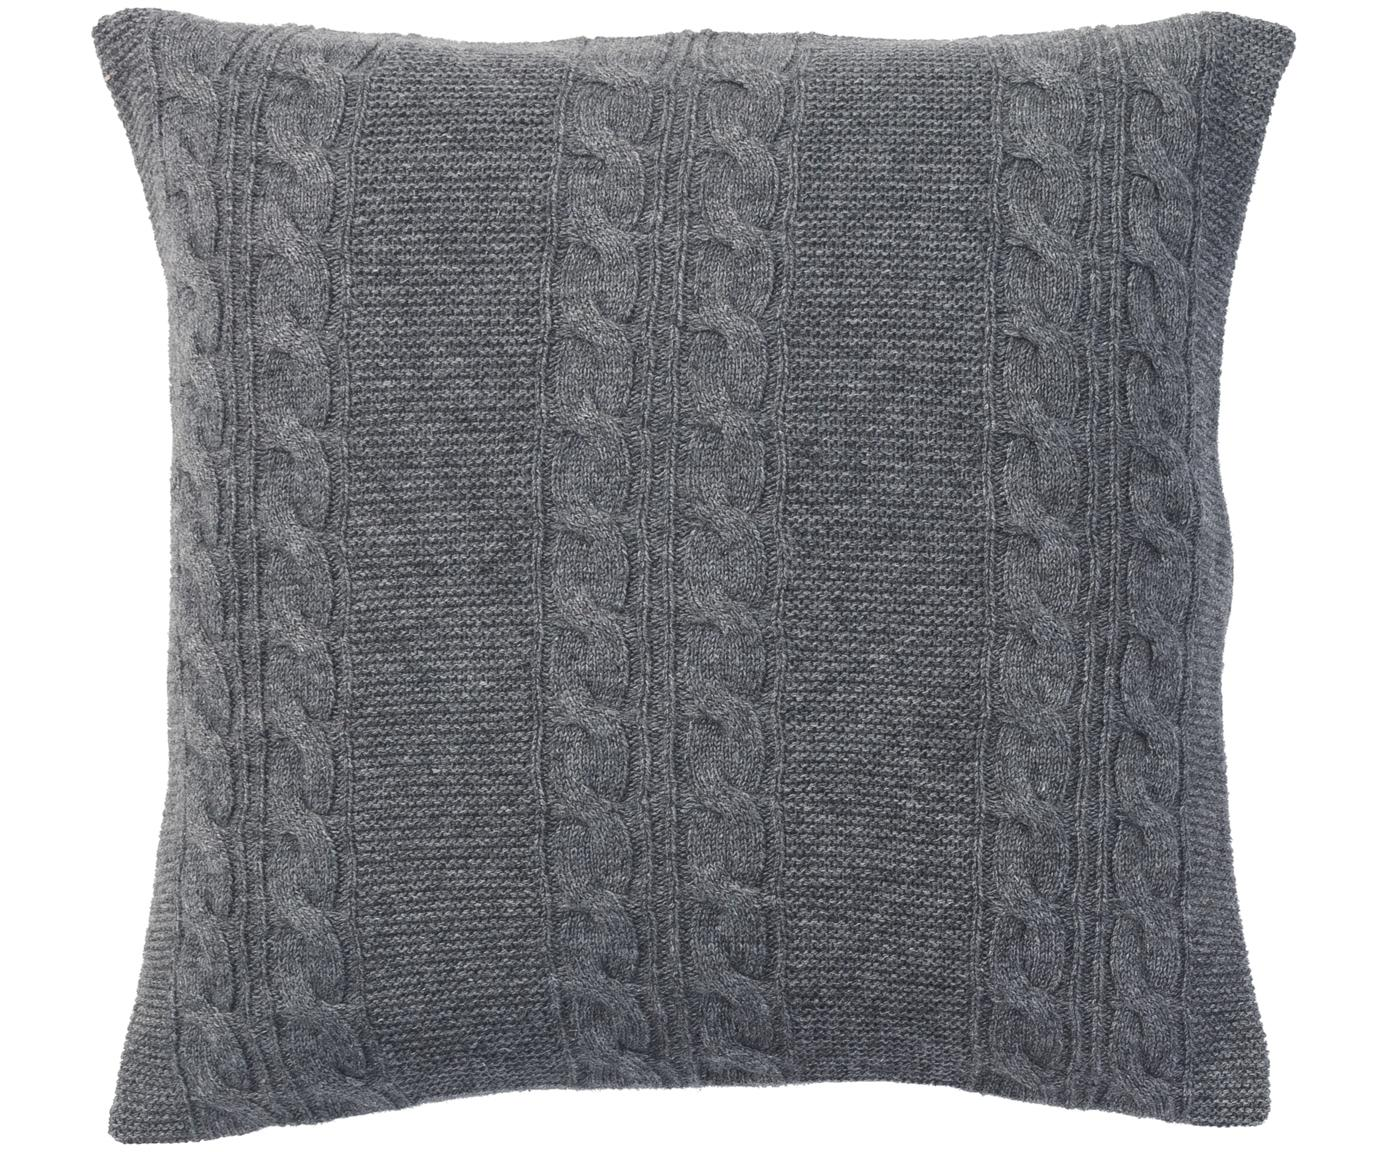 Funda de cojín de cachemira pura Leonie, 100%cachemira La cachemira es un tejido muy suave, cómodo y cálido, Gris oscuro, An 40 x L 40 cm